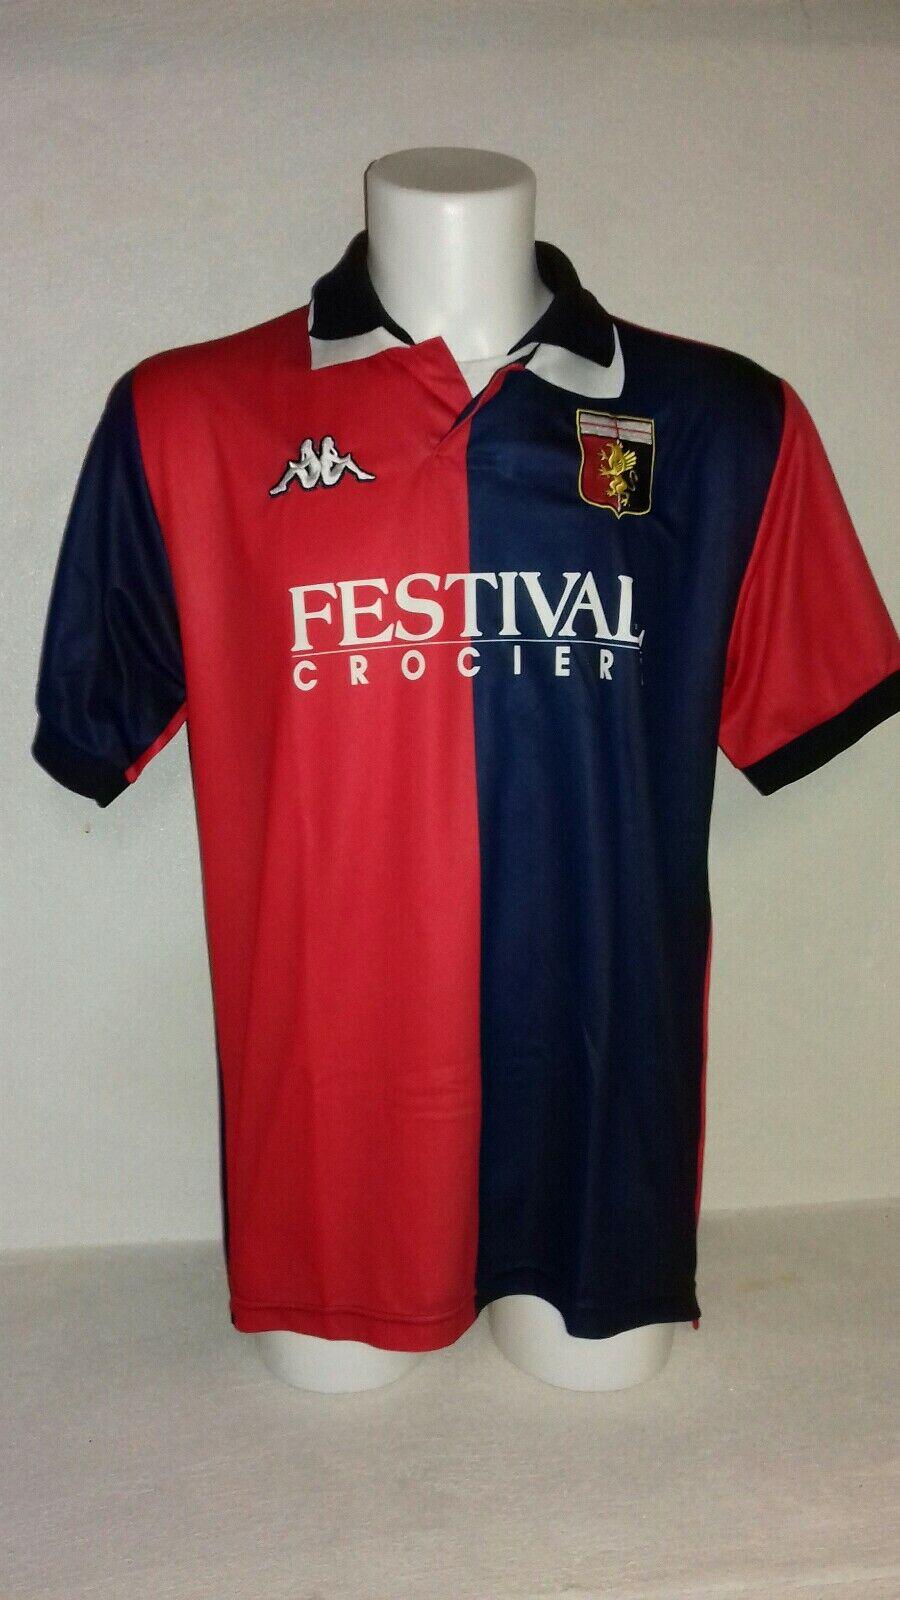 Maglia Genoa 199899 Kappa shirt trikot maillot camiseta footbtutti vintage Genova